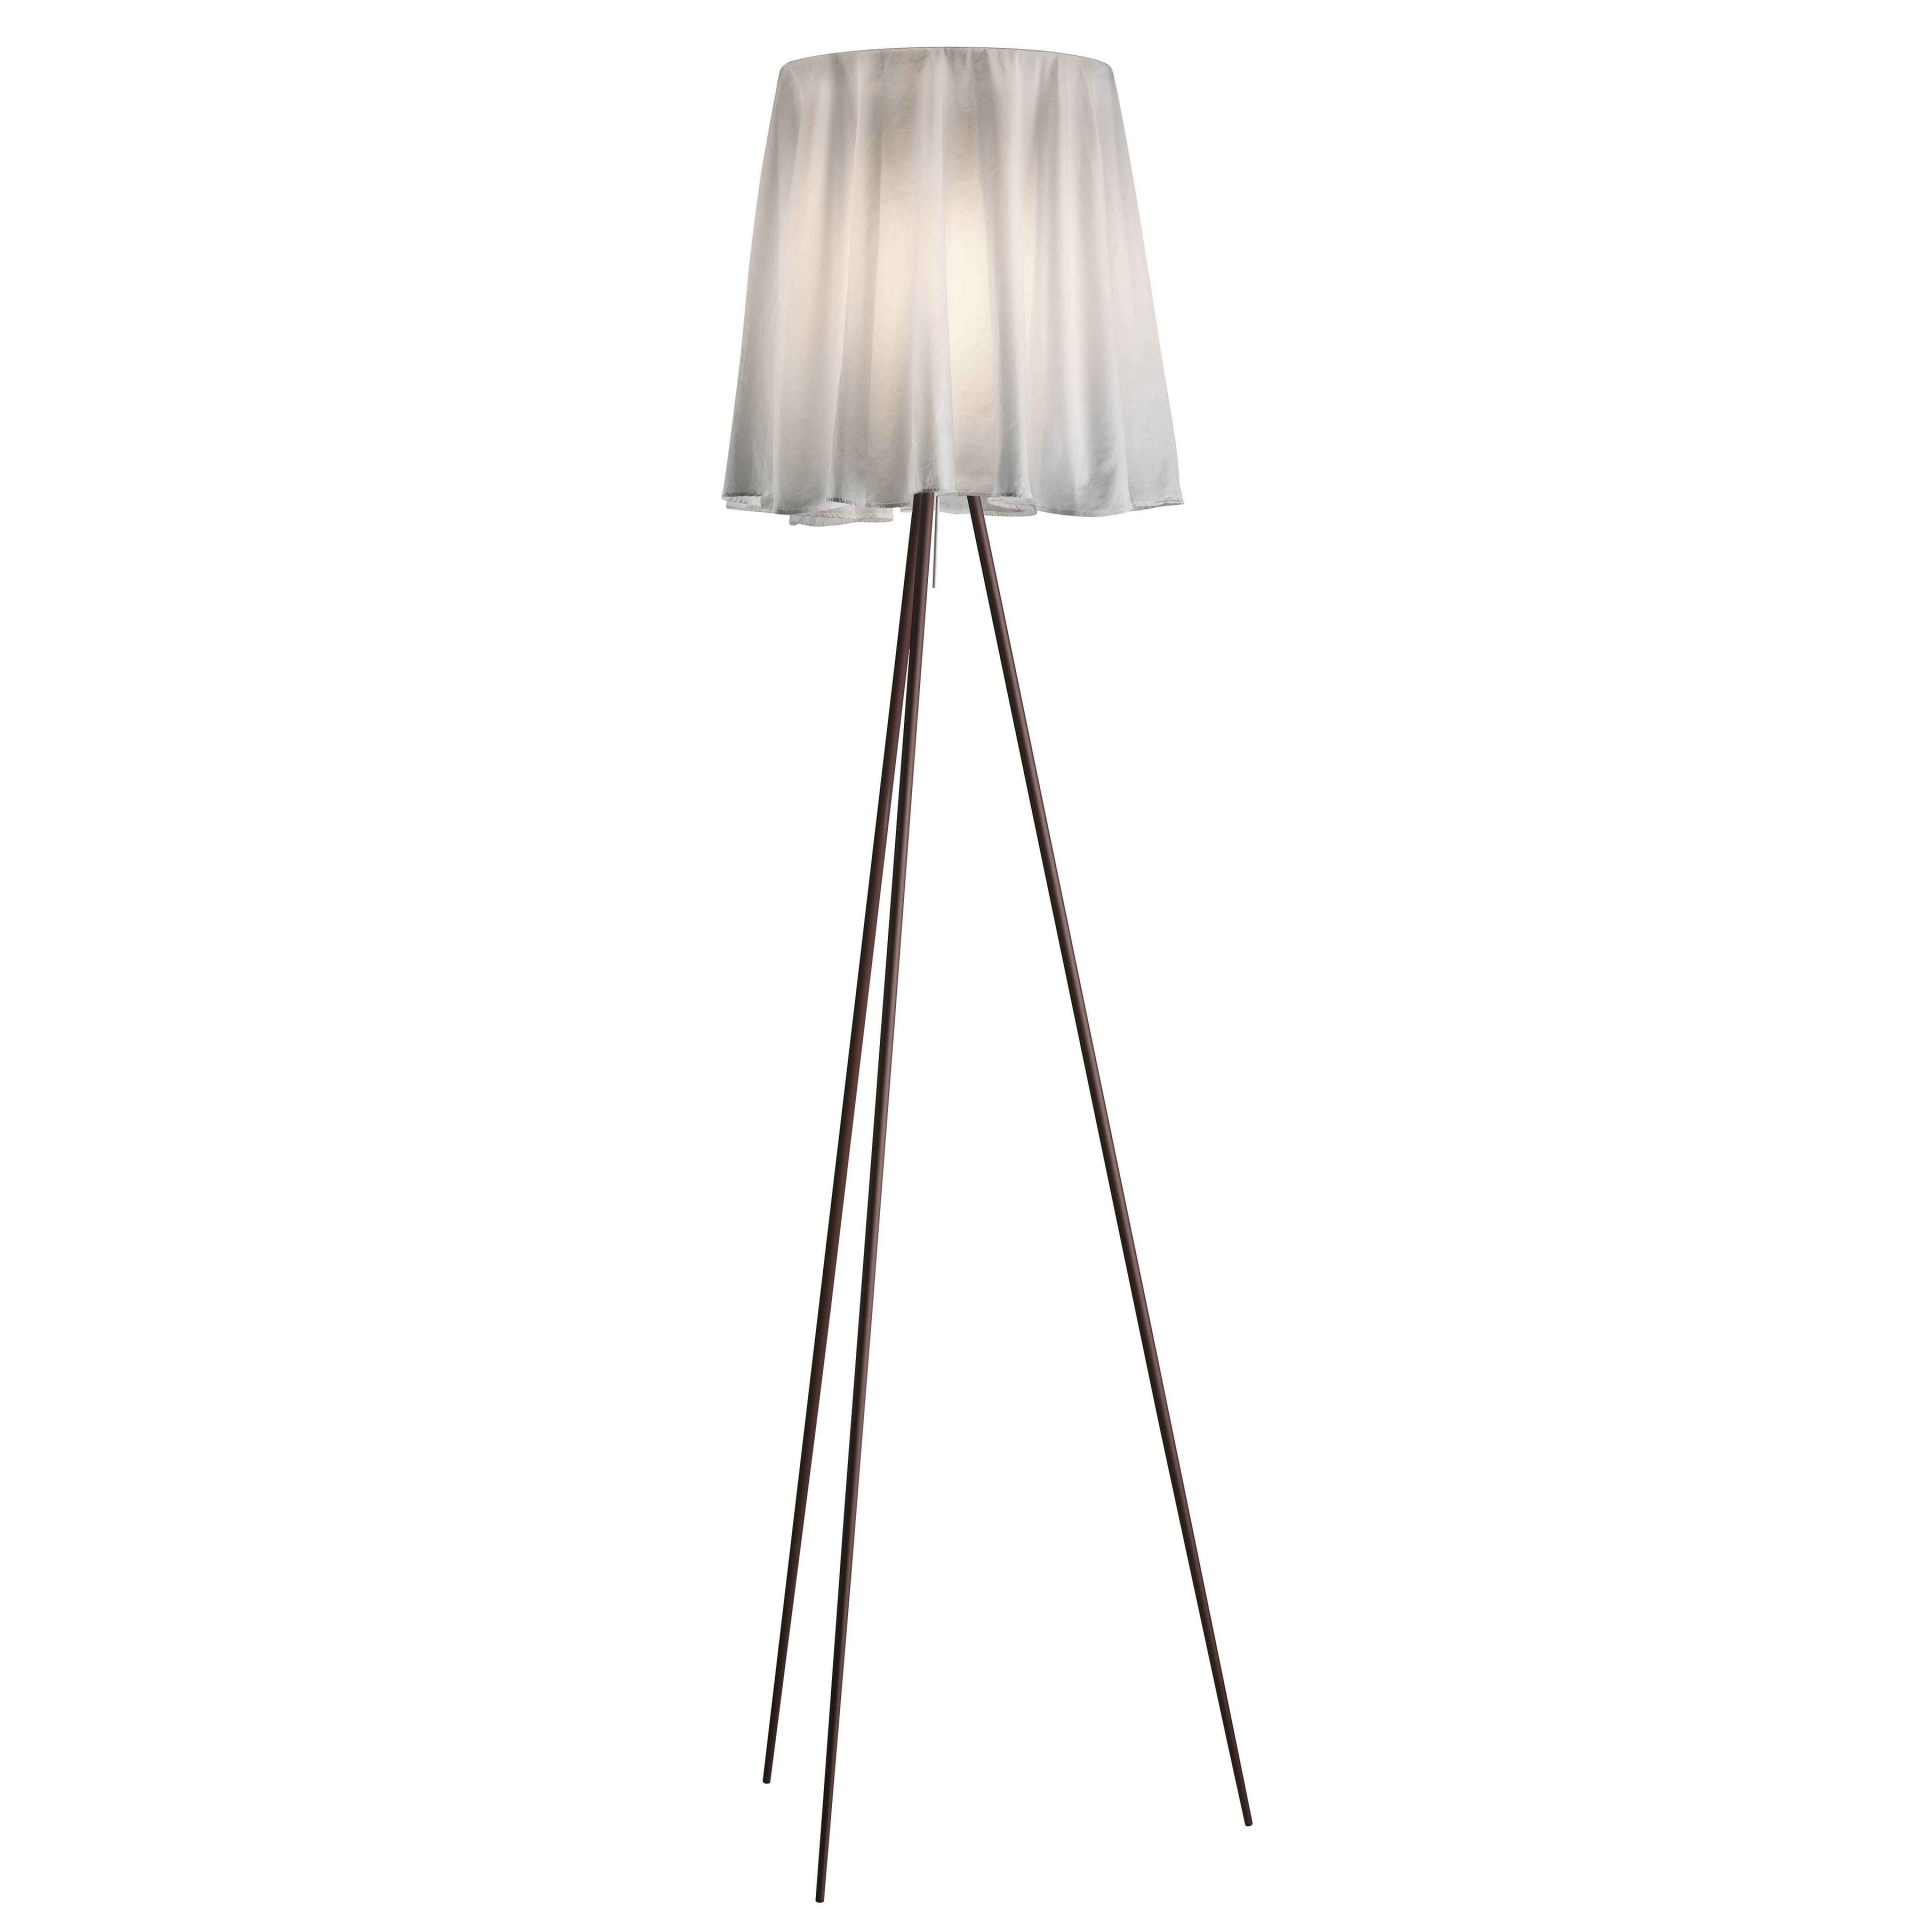 Flos designové stojací lampy Rosy Angelis